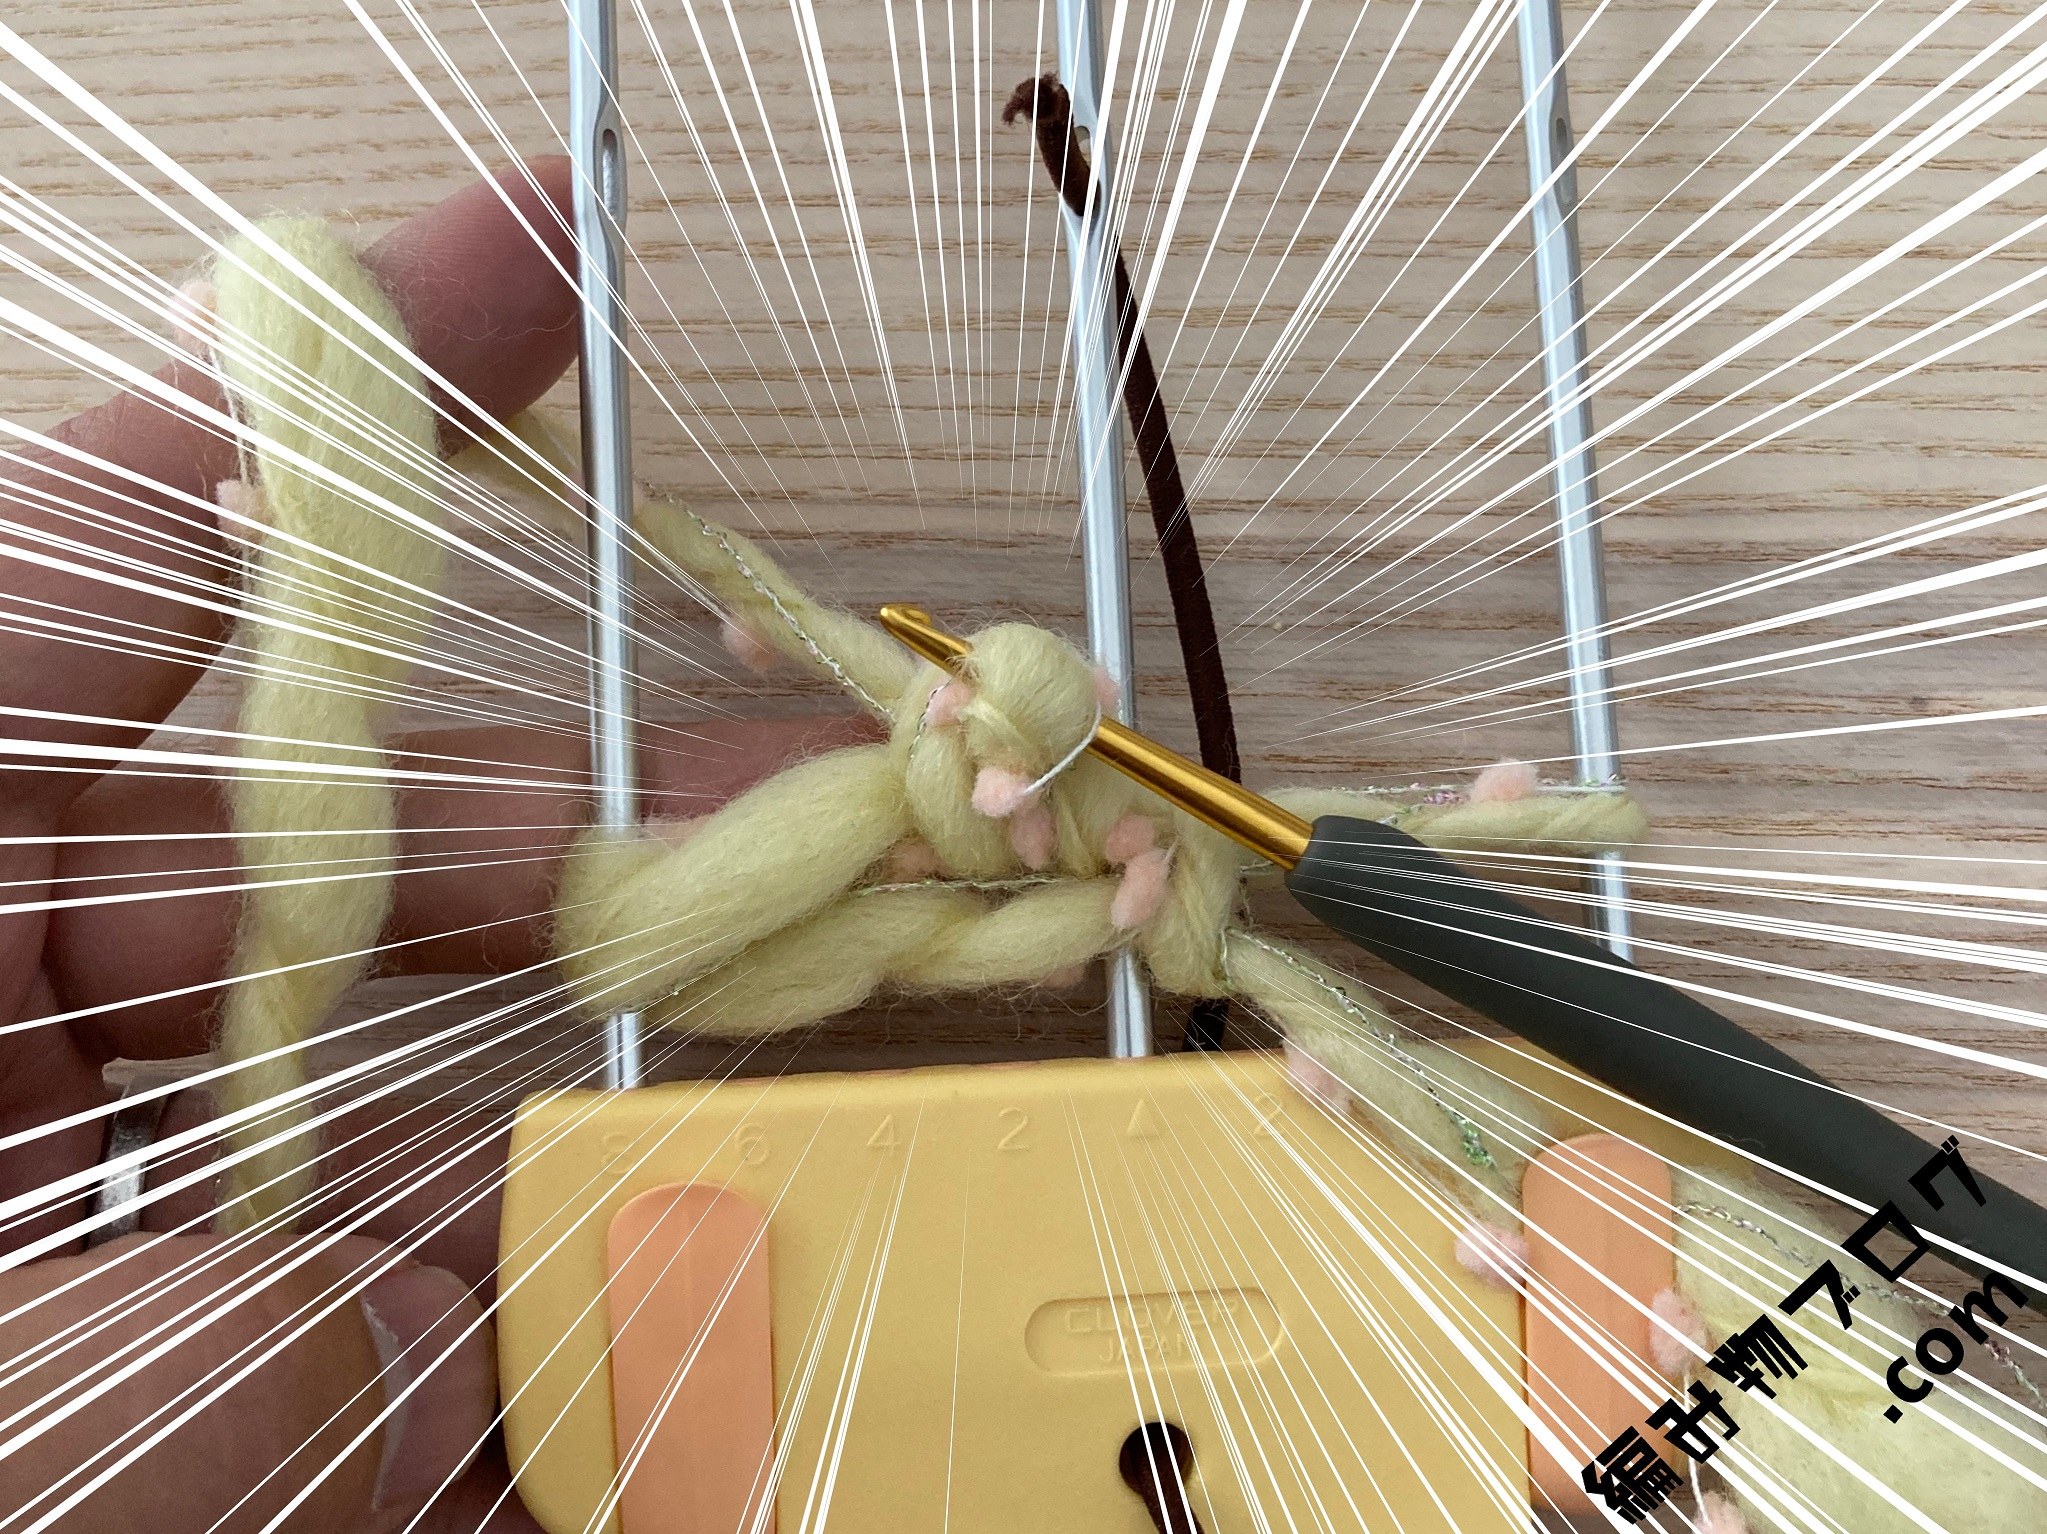 web編み物教室:ヘアピンレースで糸が太い時の対処法